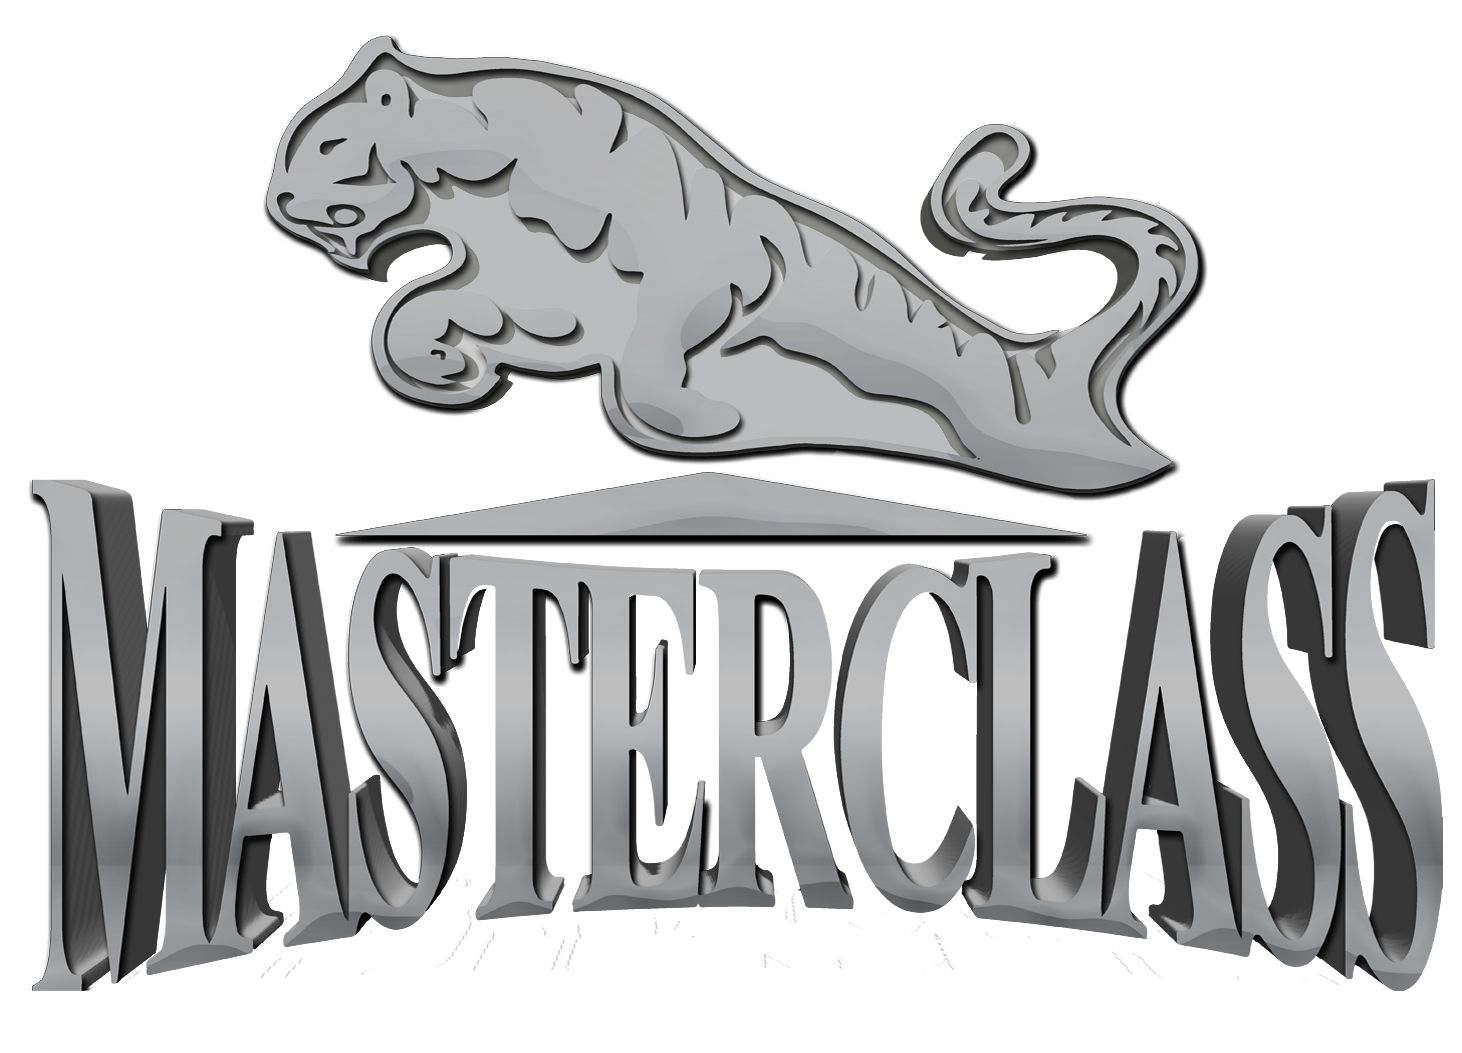 http://masterclassts.wix.com/masterclass